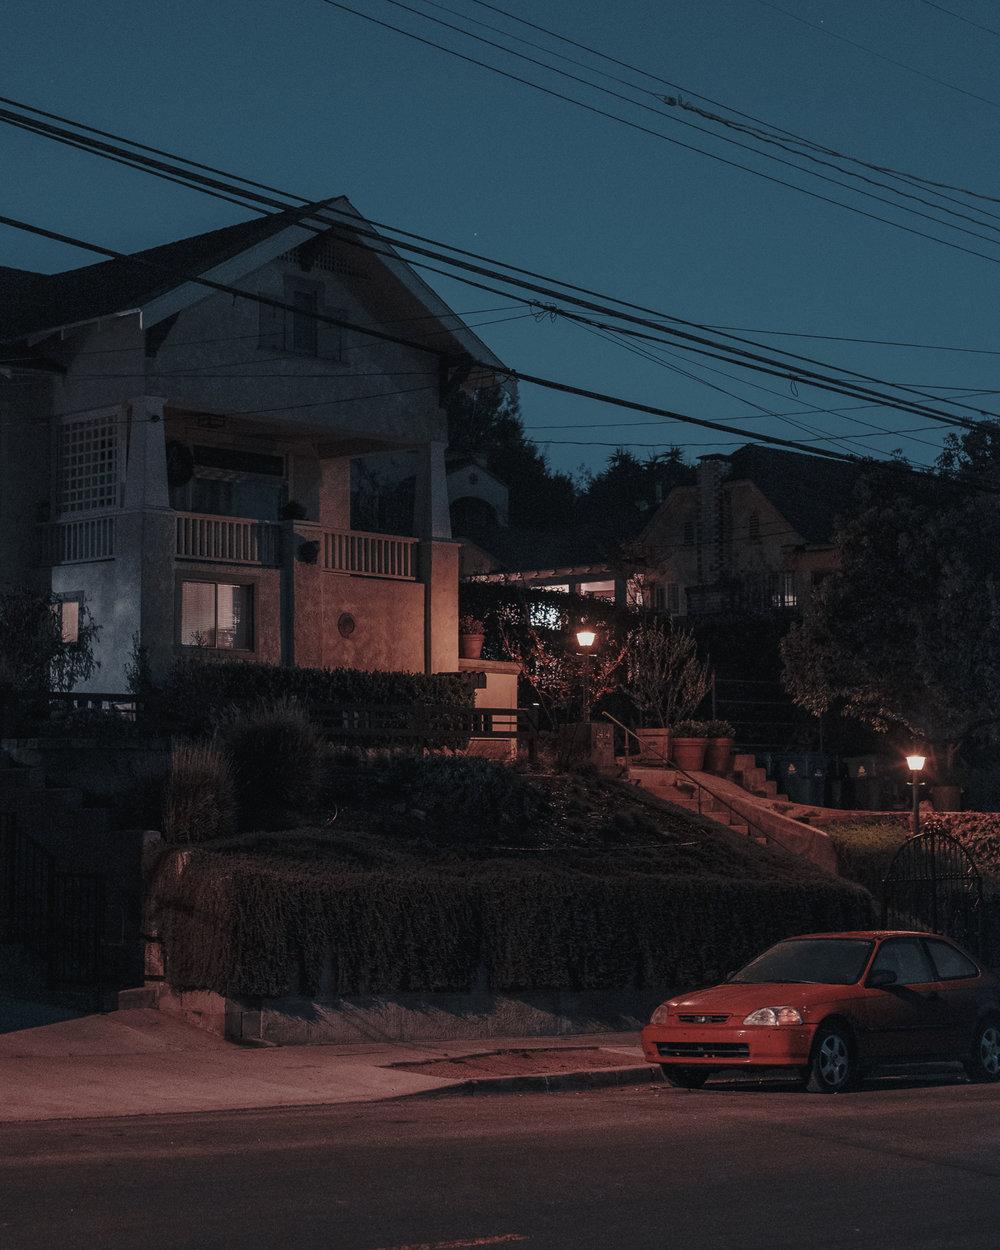 Nights-33.jpg